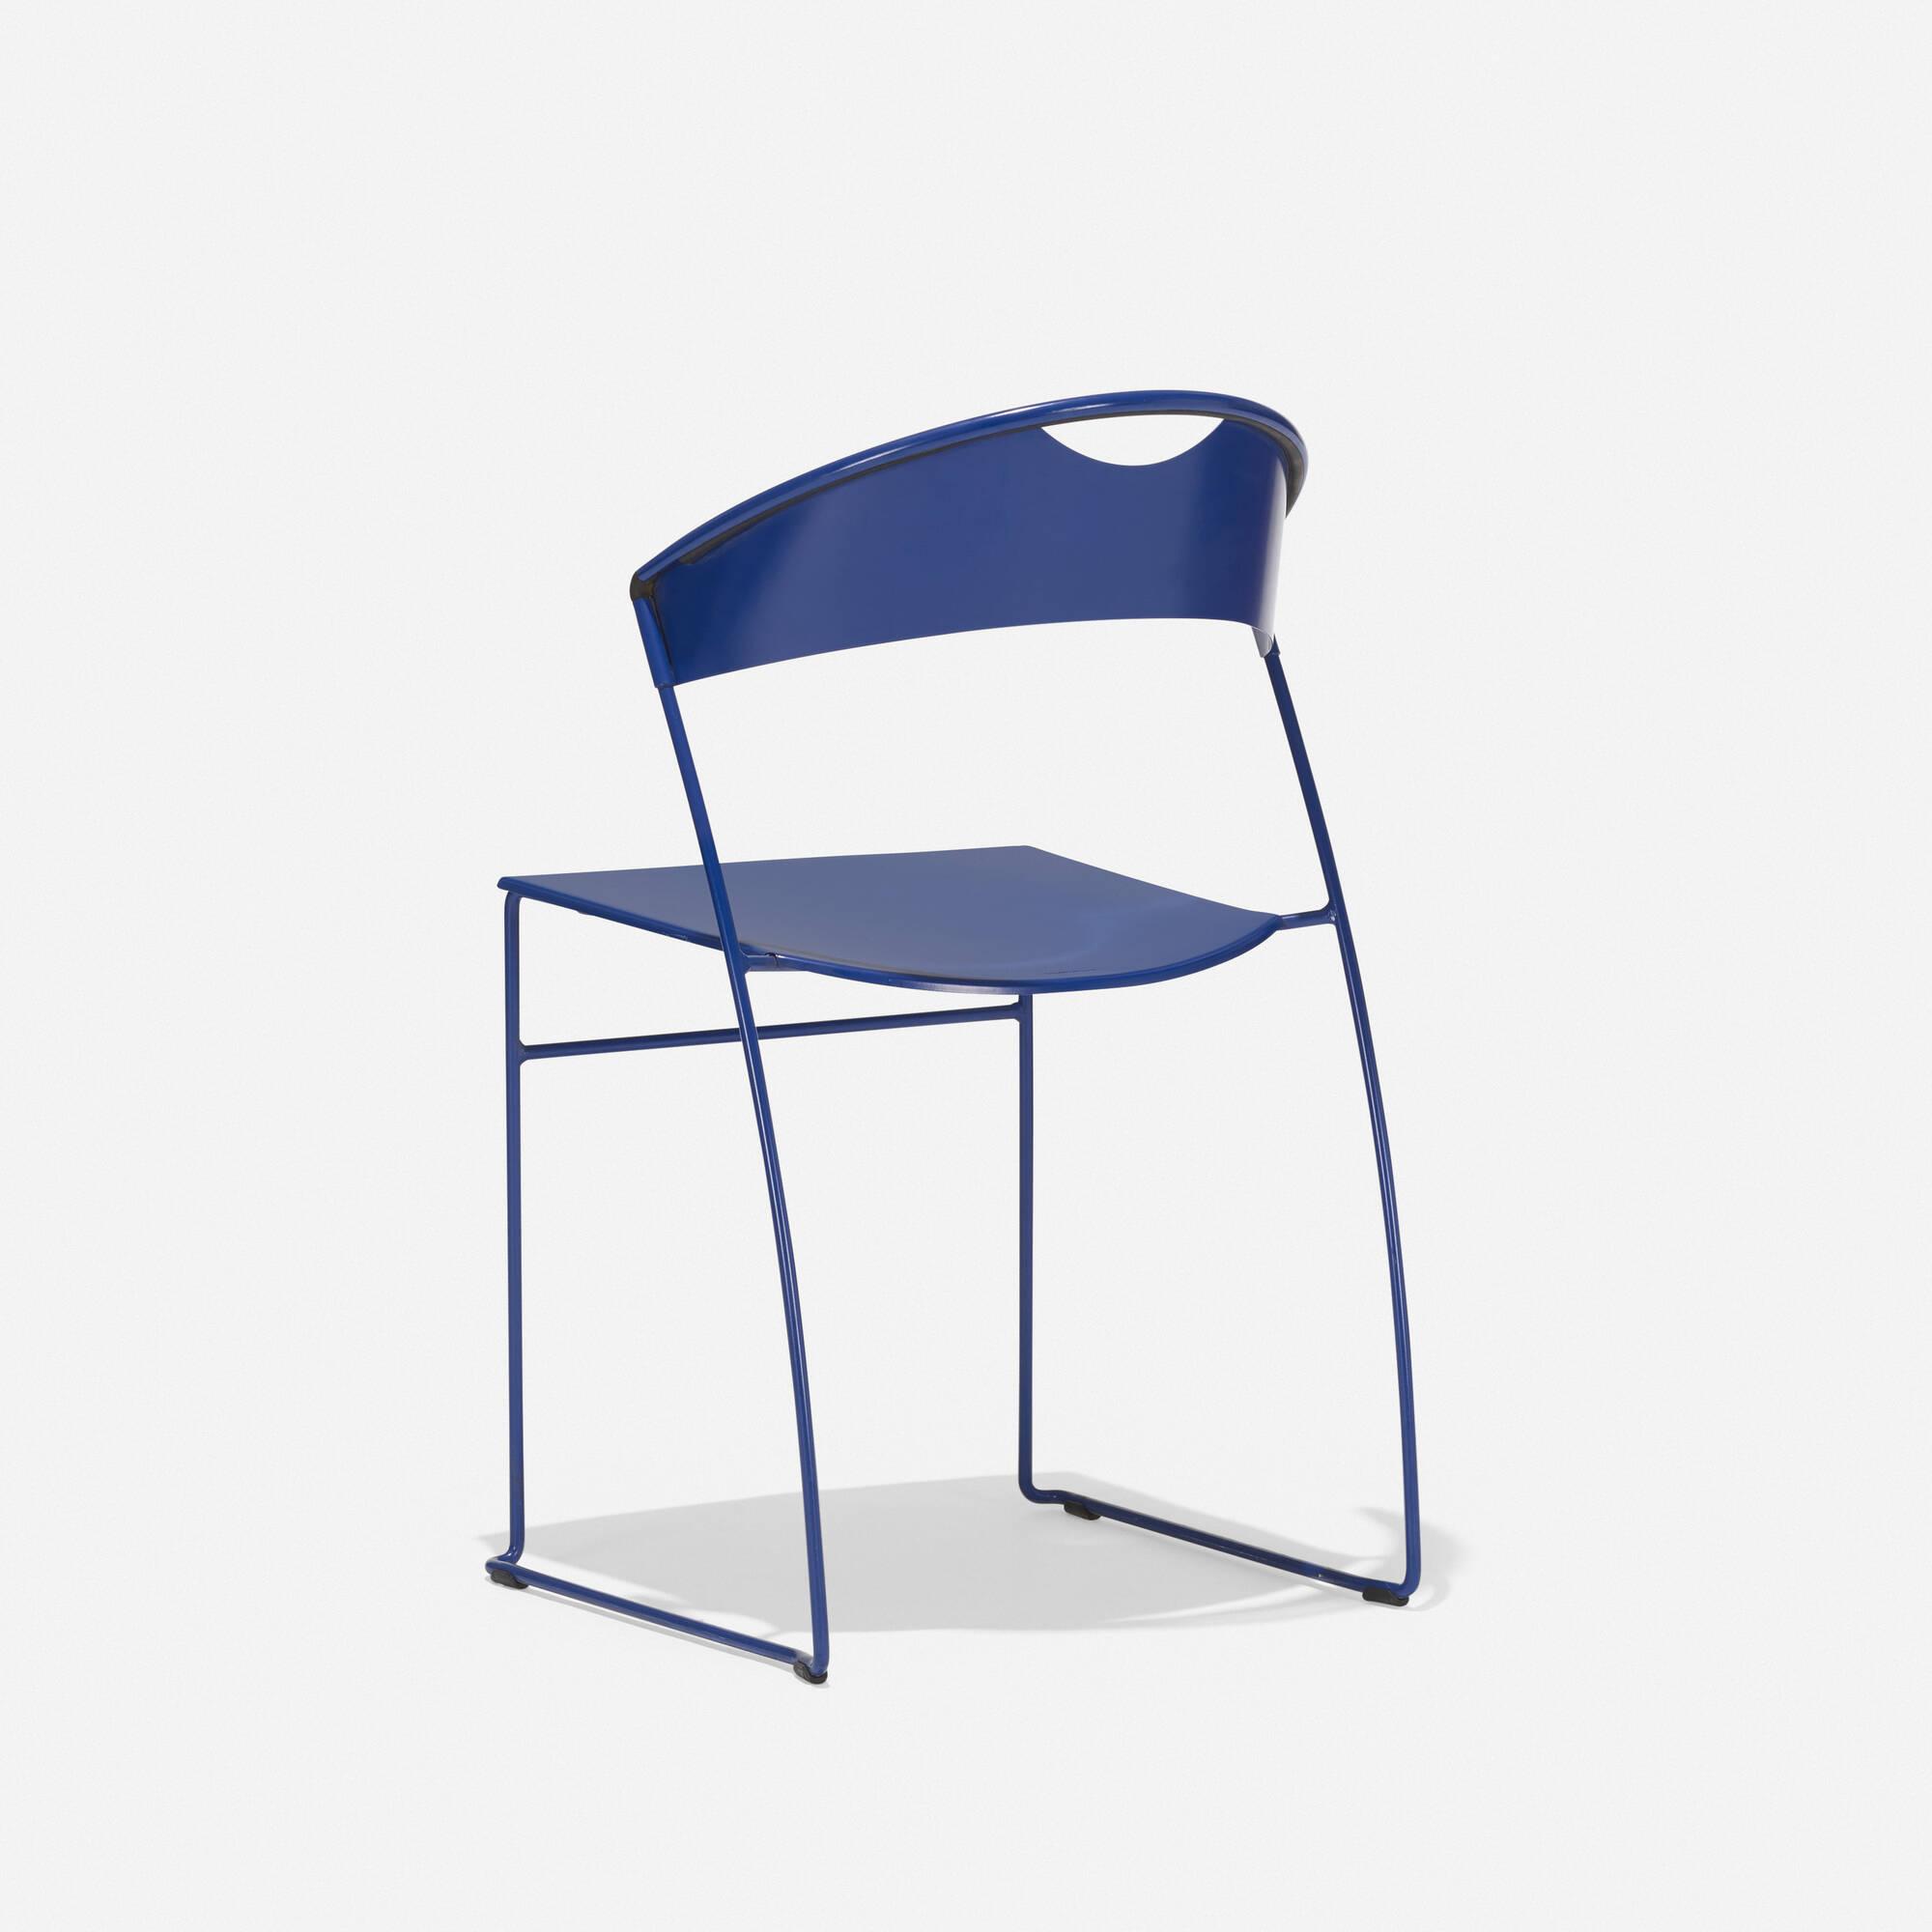 411: Hannes Wettstein / Juliette chair (3 of 4)